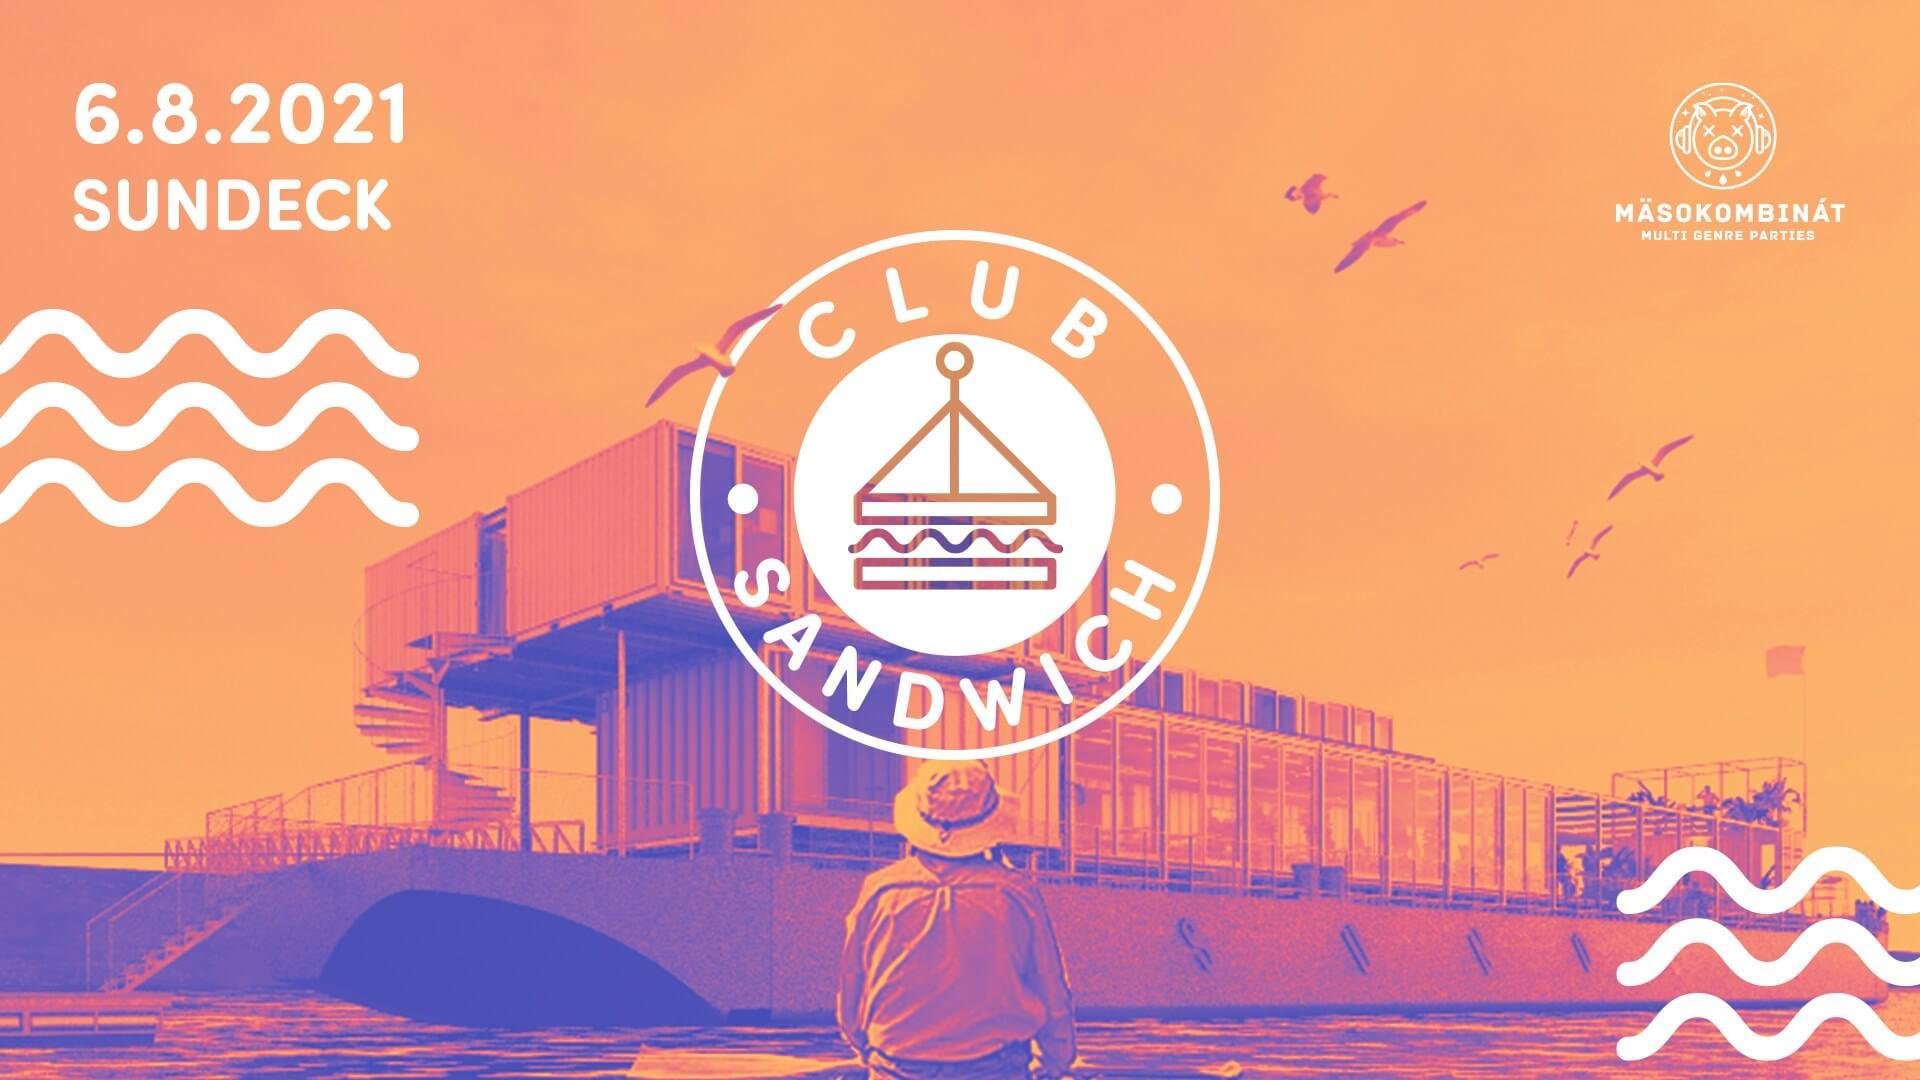 sundeck-club-sandwich-salute